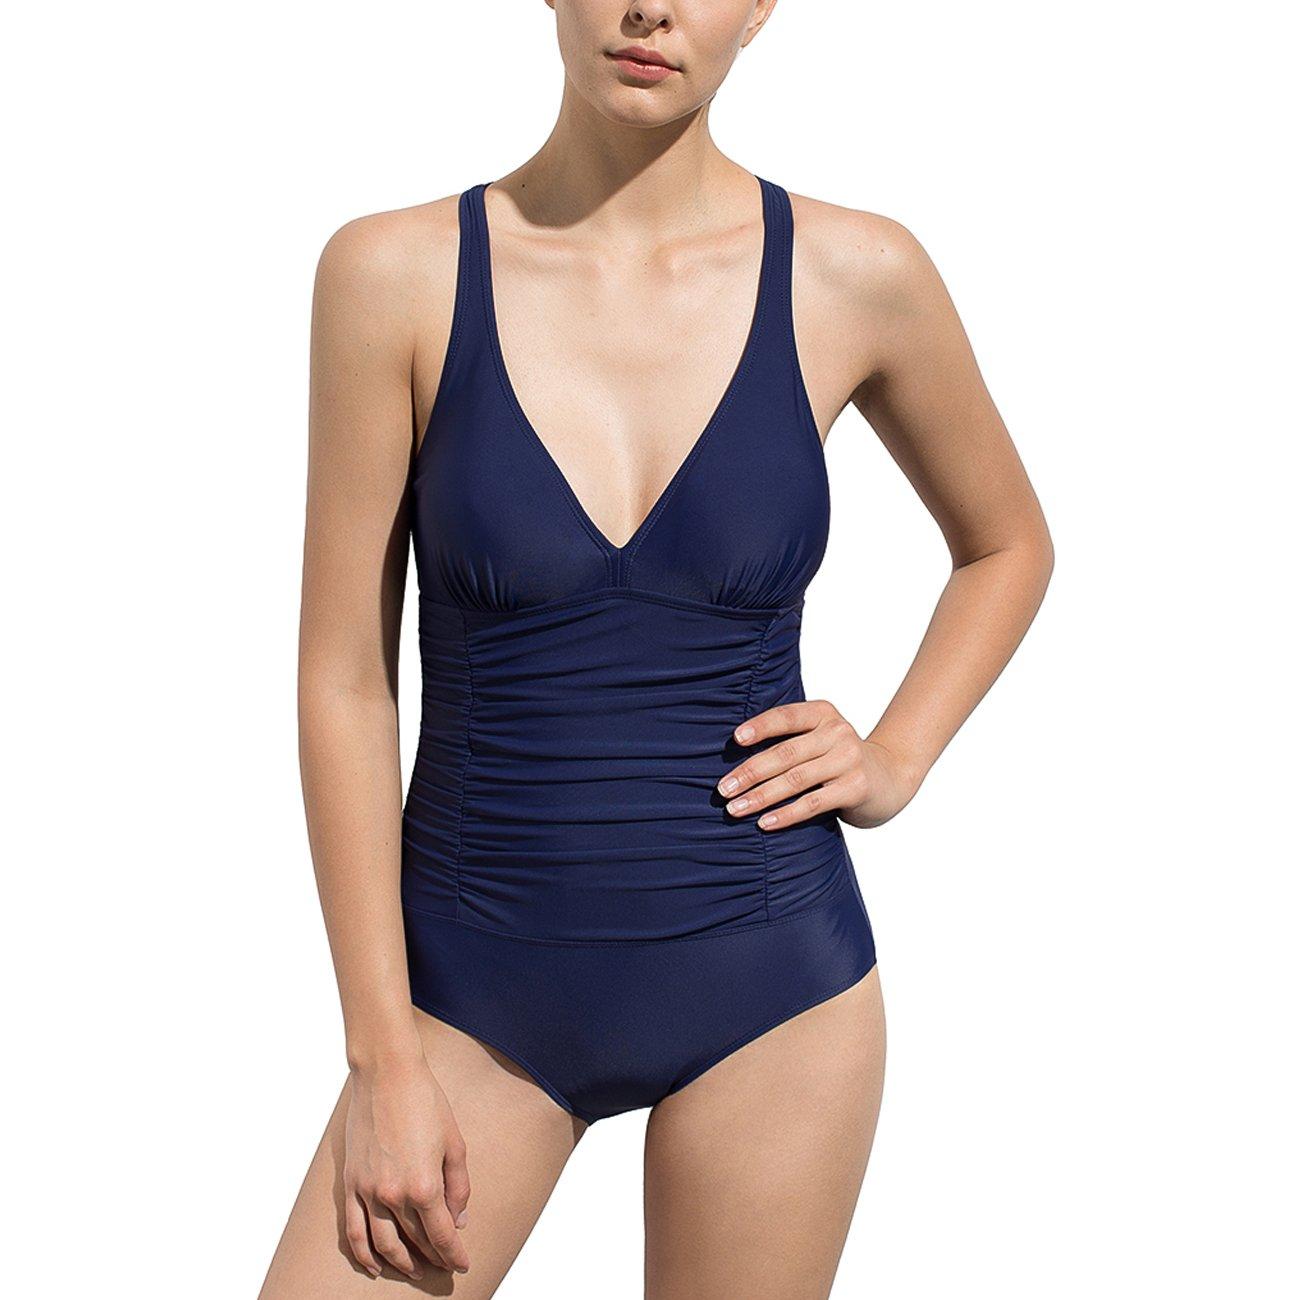 HAIVIDO Women's V Neck Shirred Tummy Control Wide Shoulder Straps One Piece Swimsuit HAISU185OP10CA